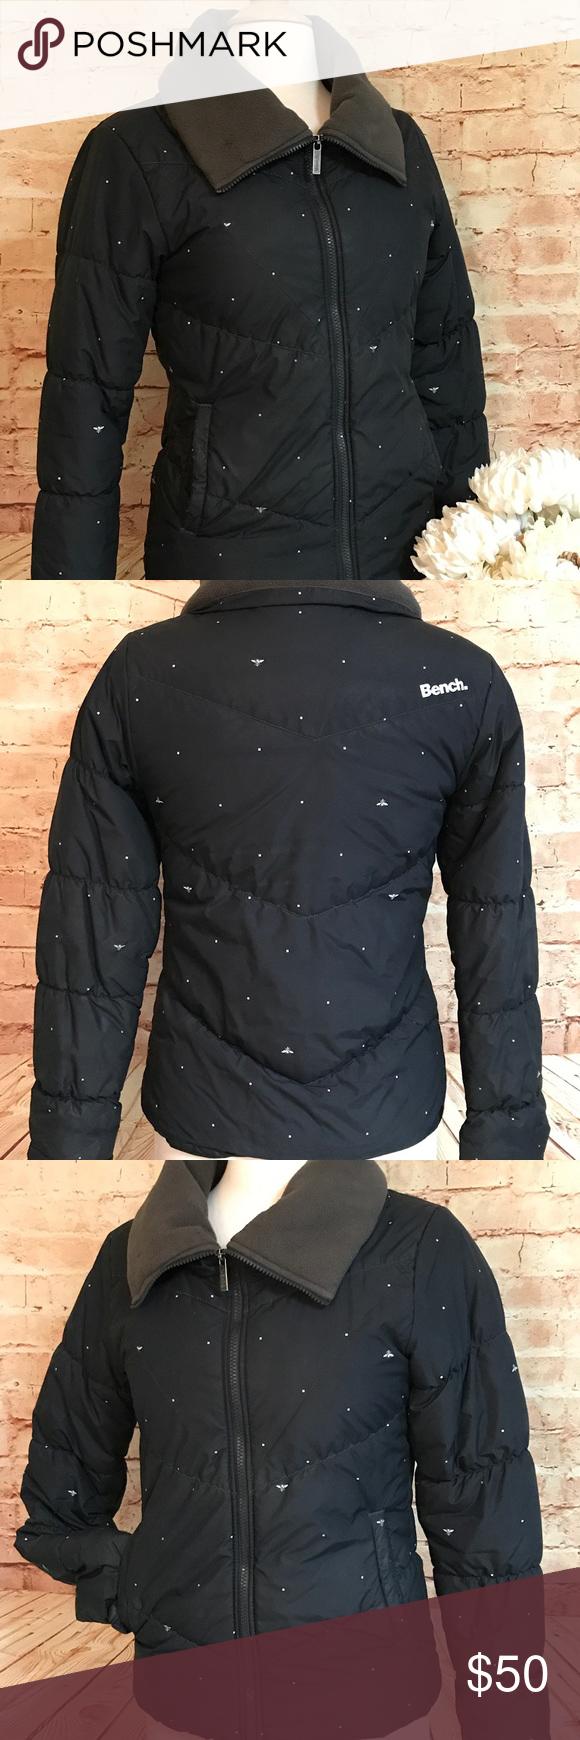 Sold Bench Urbanwear Black Polka Puffer Jacket Urban Wear Puffer Jacket Women Clothes Design [ 1740 x 580 Pixel ]